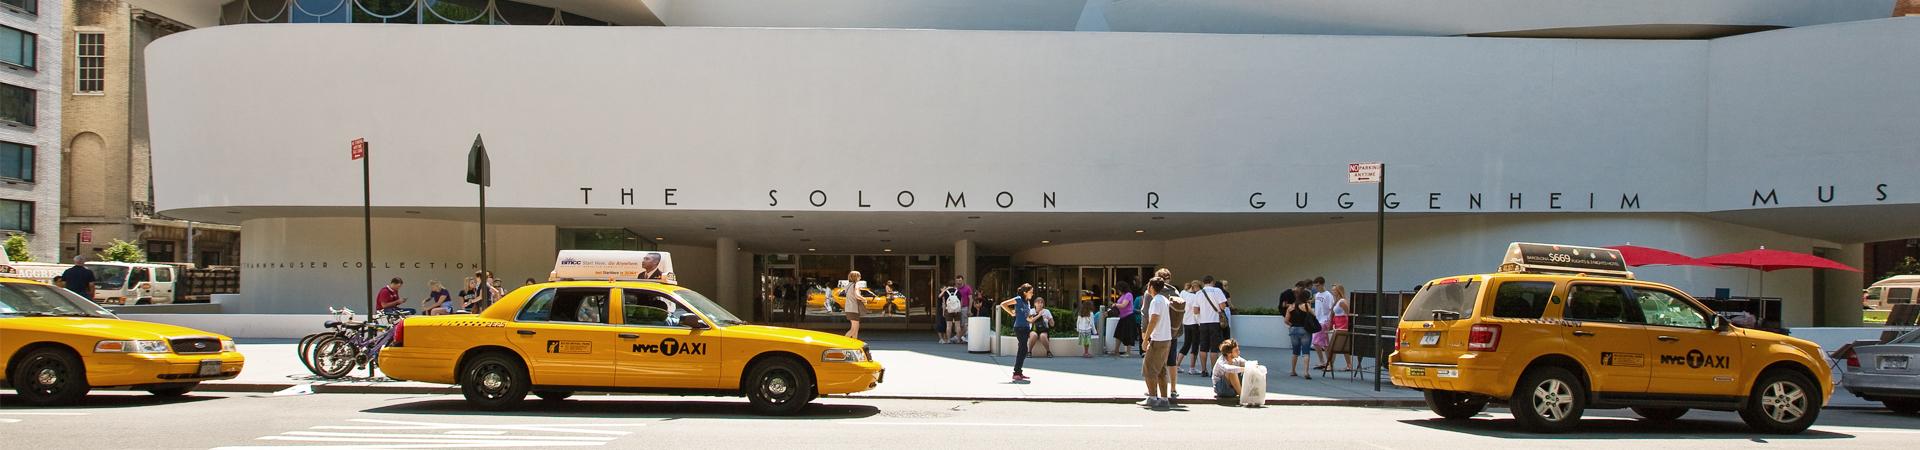 Guggenheim Museum 5th Avenue